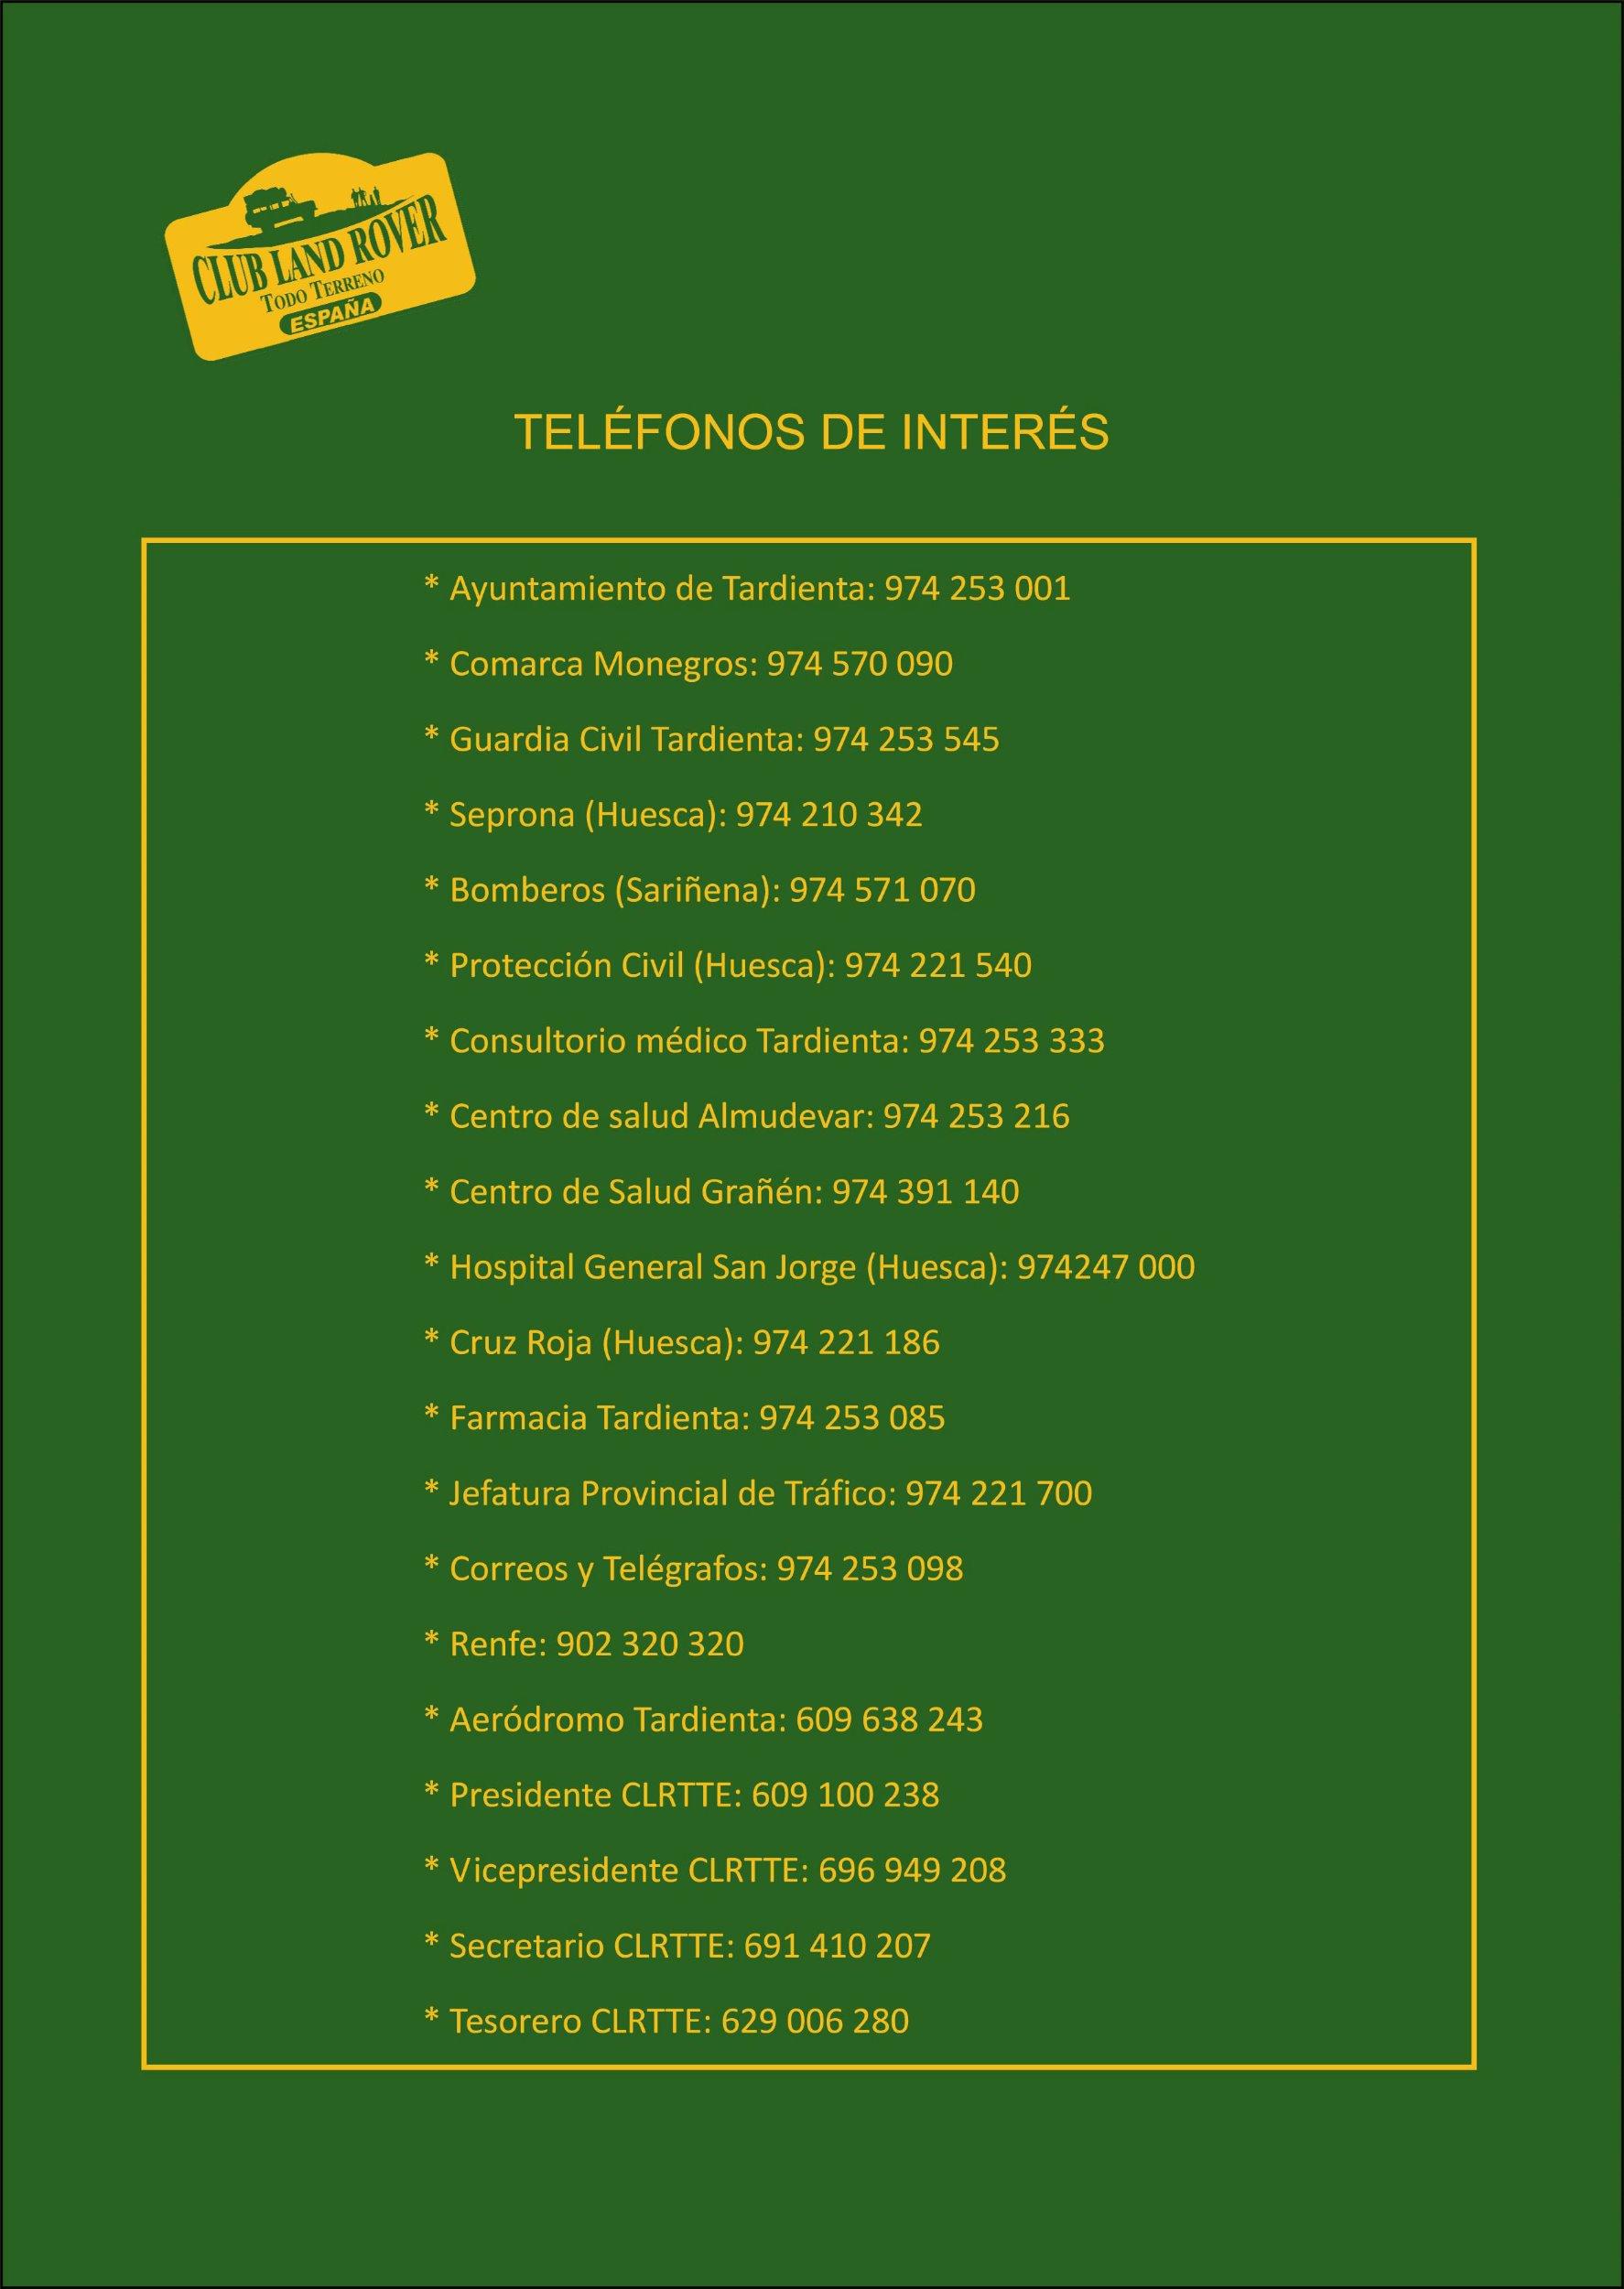 18_Telfonosdeinters.jpg